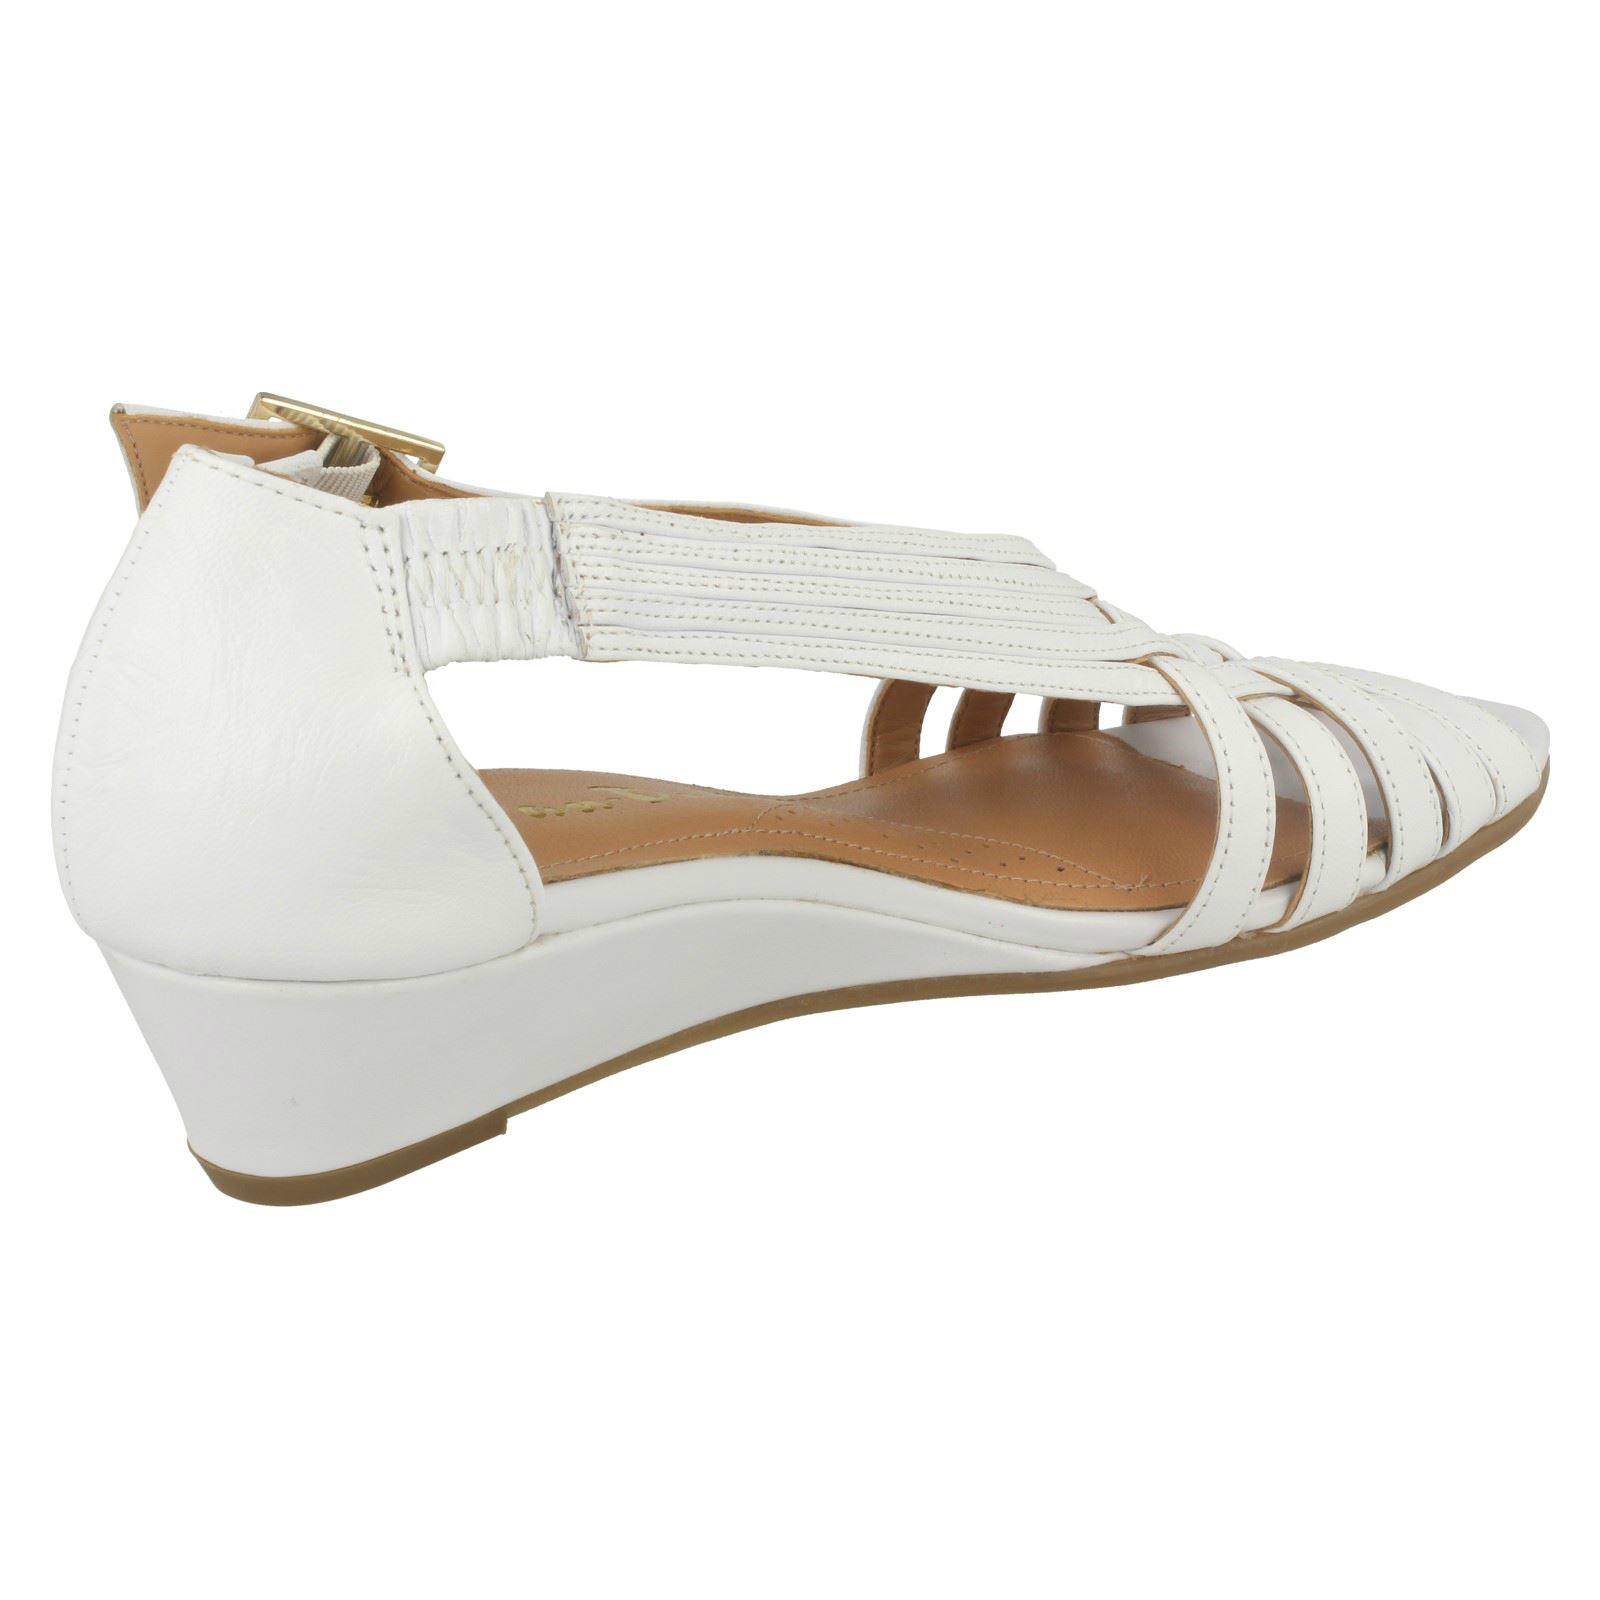 Ladies-Van-Dal-Wedge-Strappy-Sandals-Lucie thumbnail 19